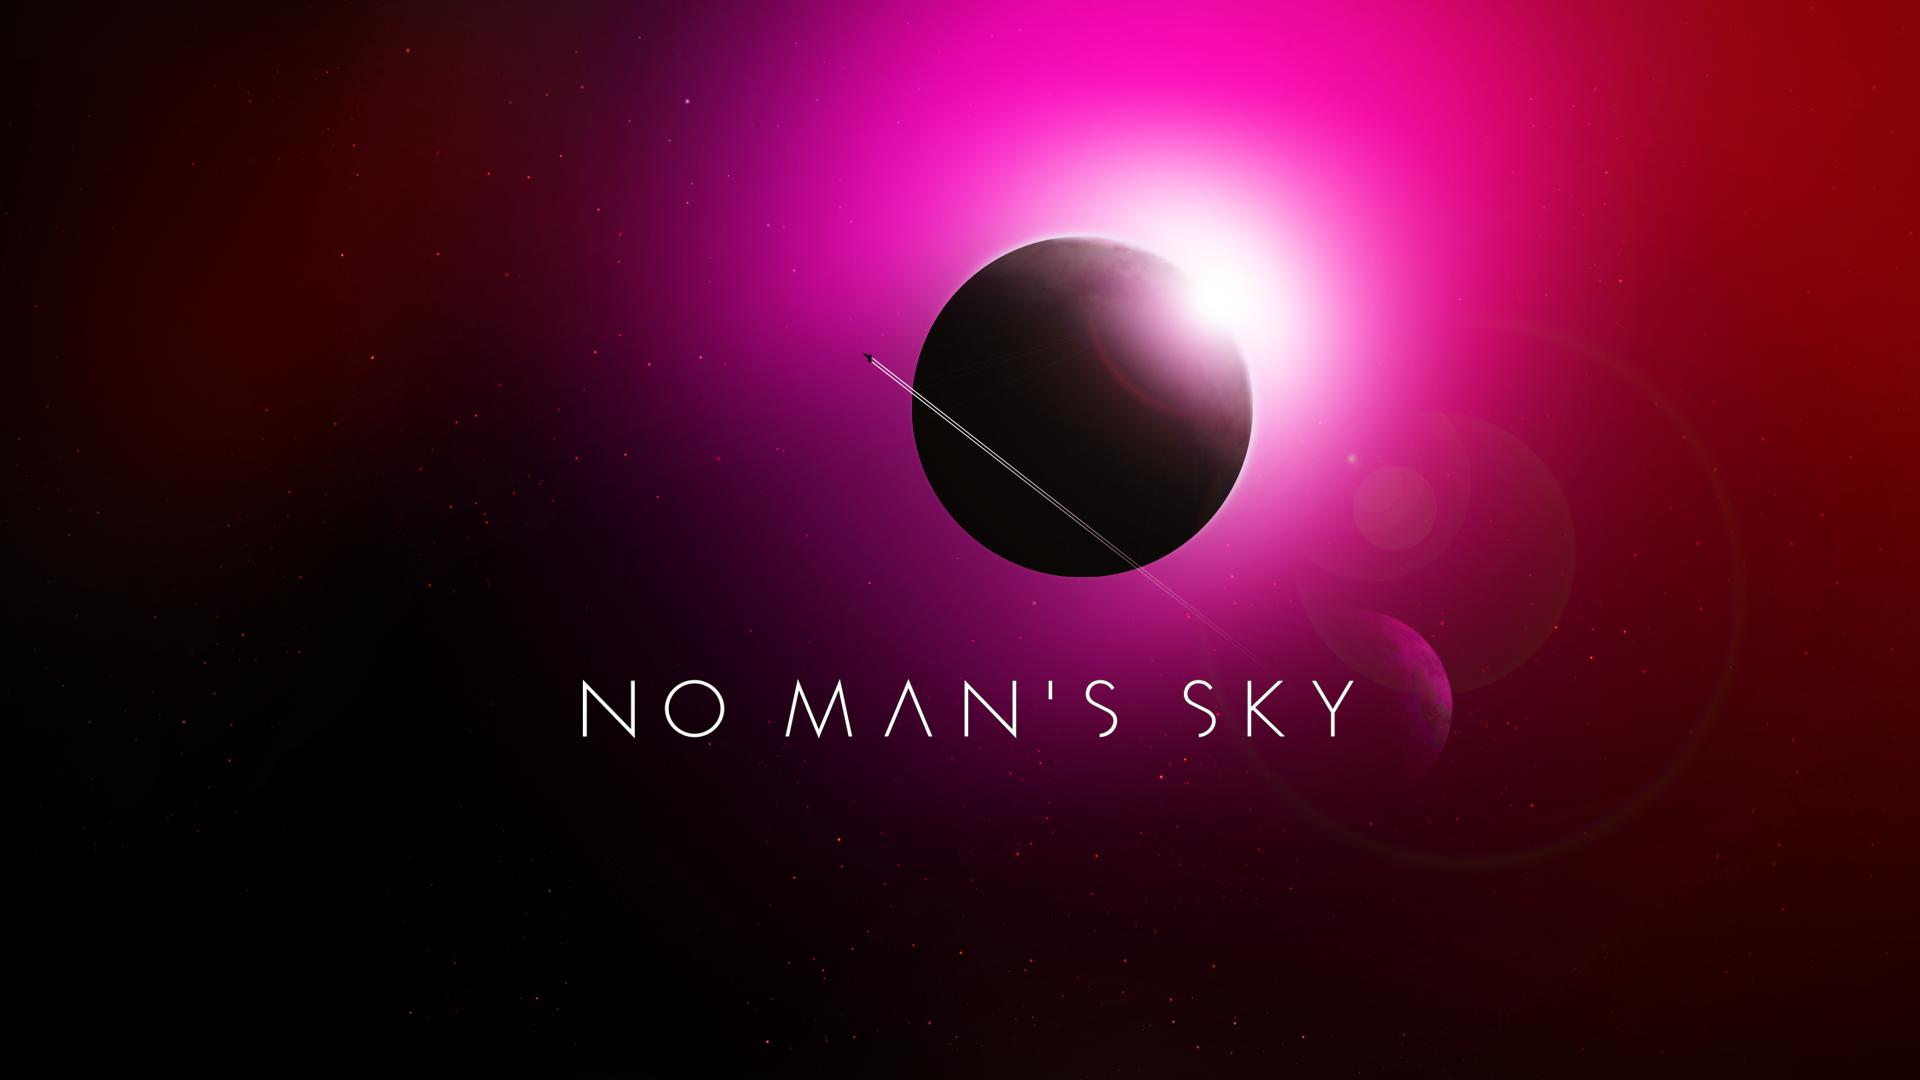 No Man's Sky Desktop Images